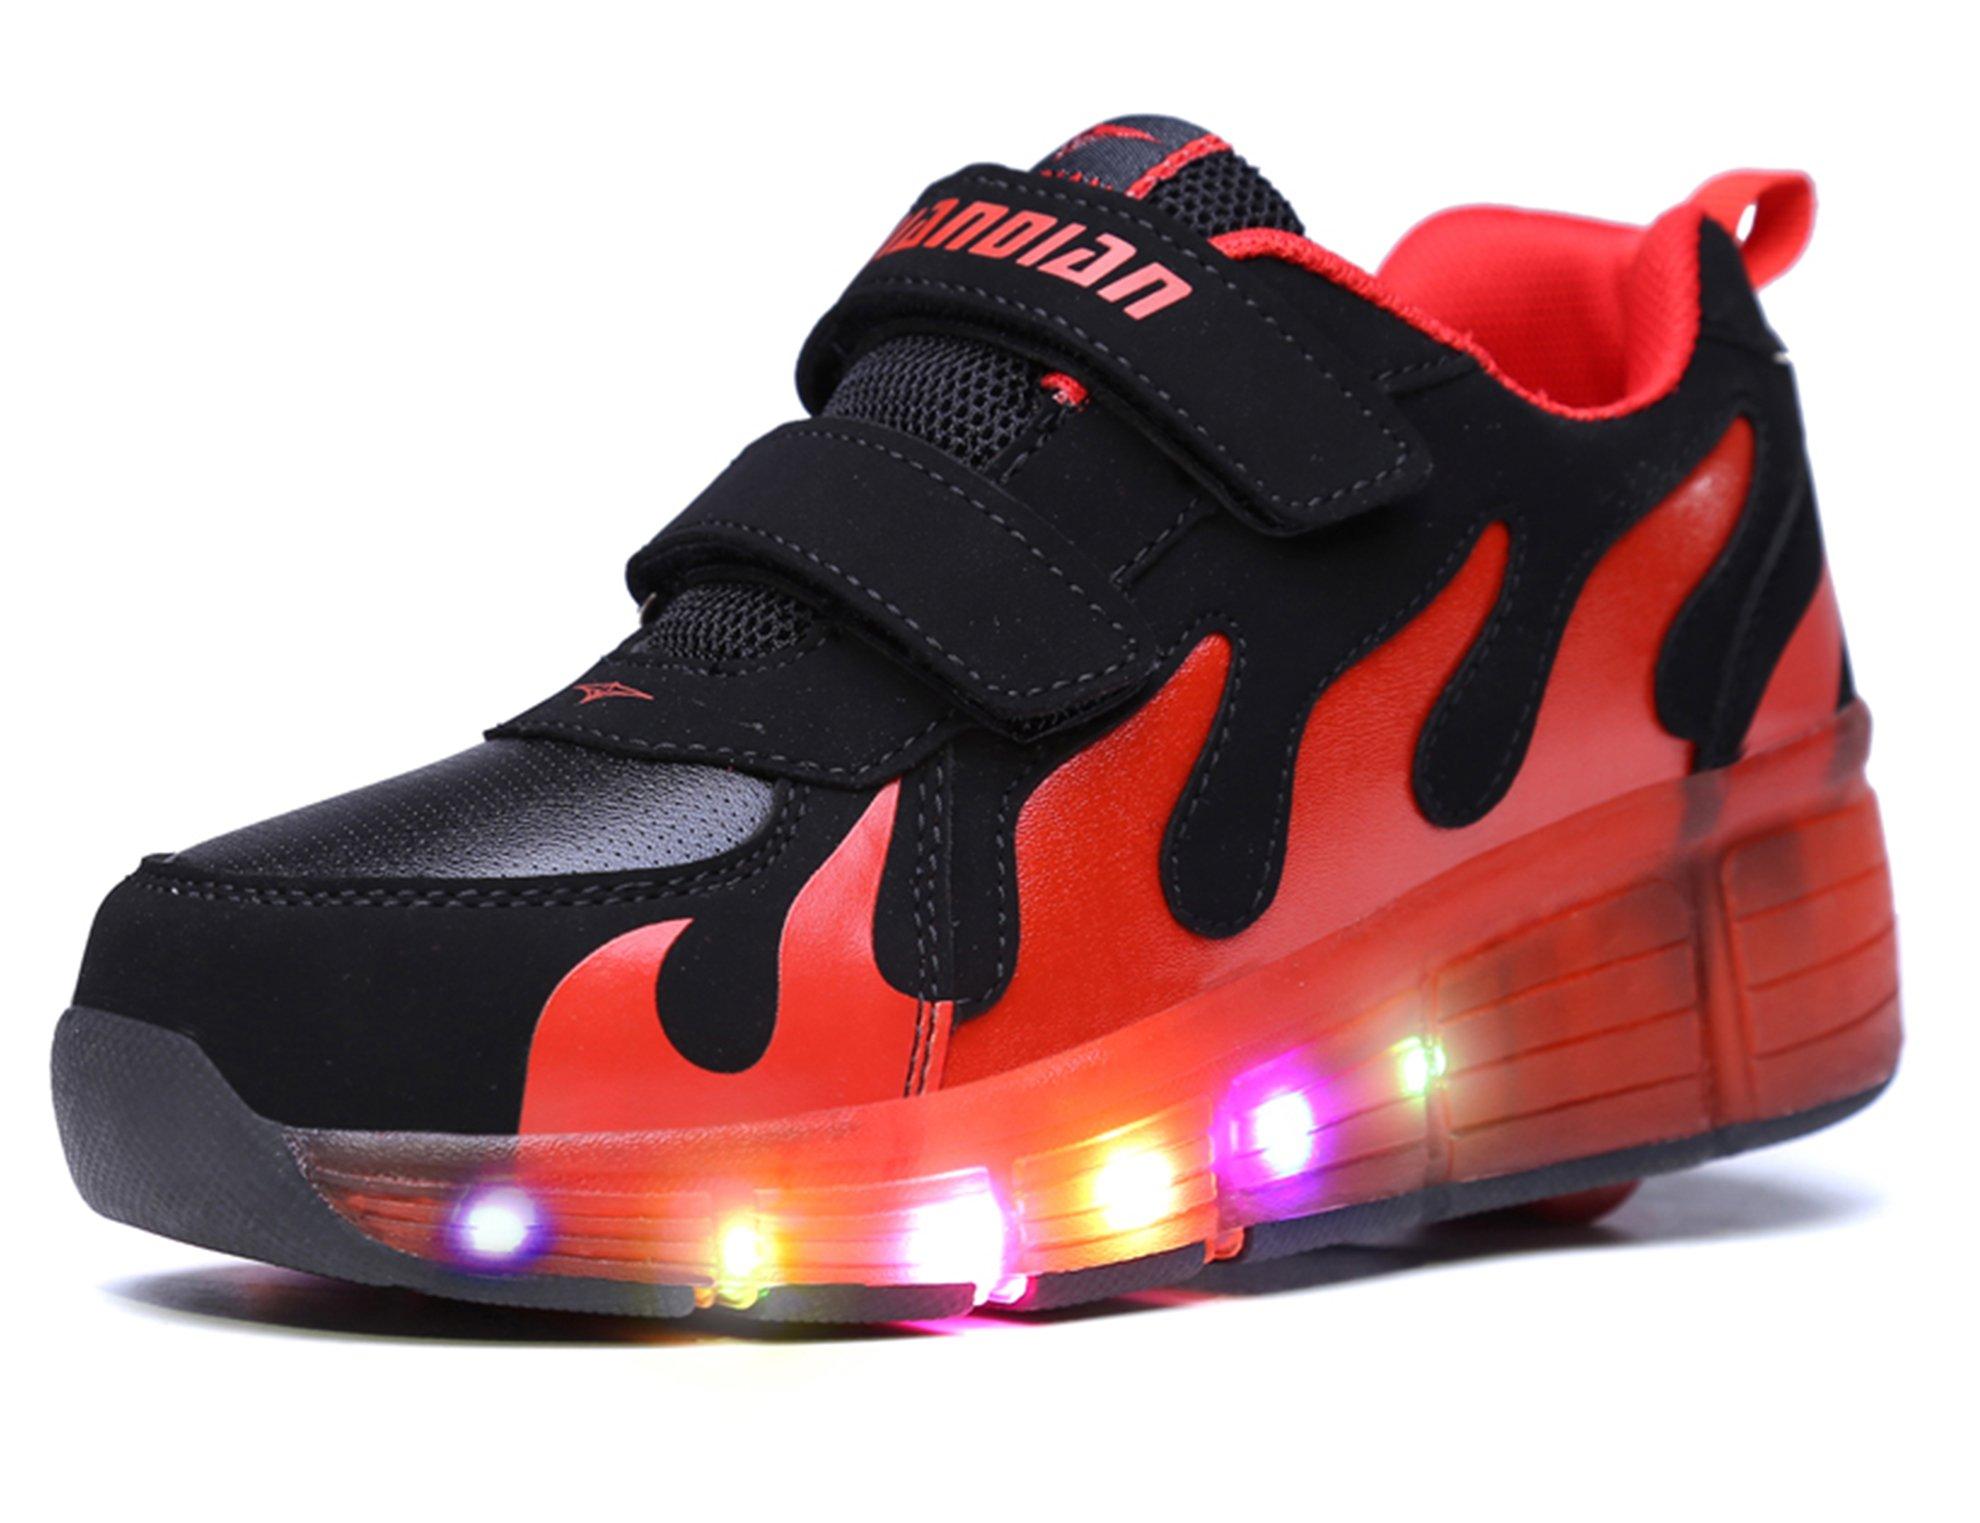 Mr.ANG luces LED parpadeantes Roller Skates – Zapatos de deporte Niños Chicos Y Chicas – Zapatos de